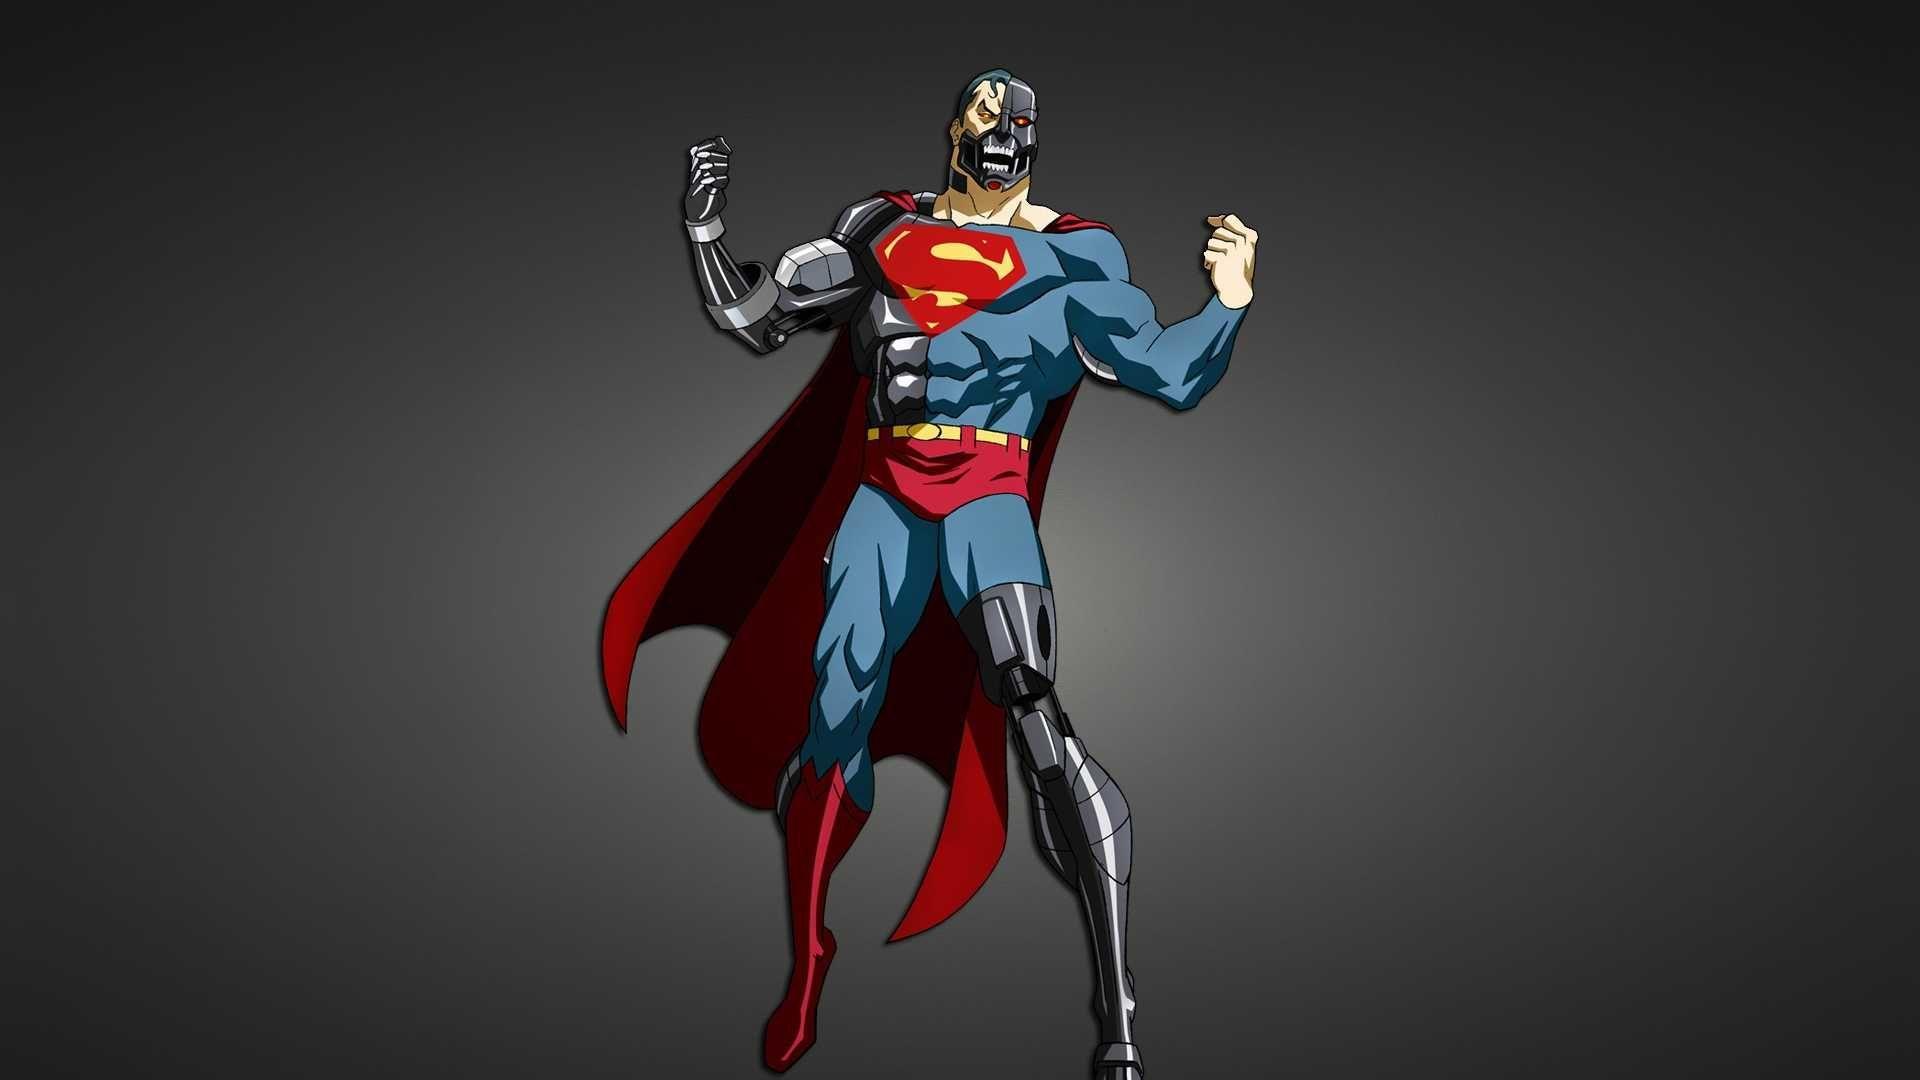 Superheroes Hd Wallpapers Wallpaper Cave